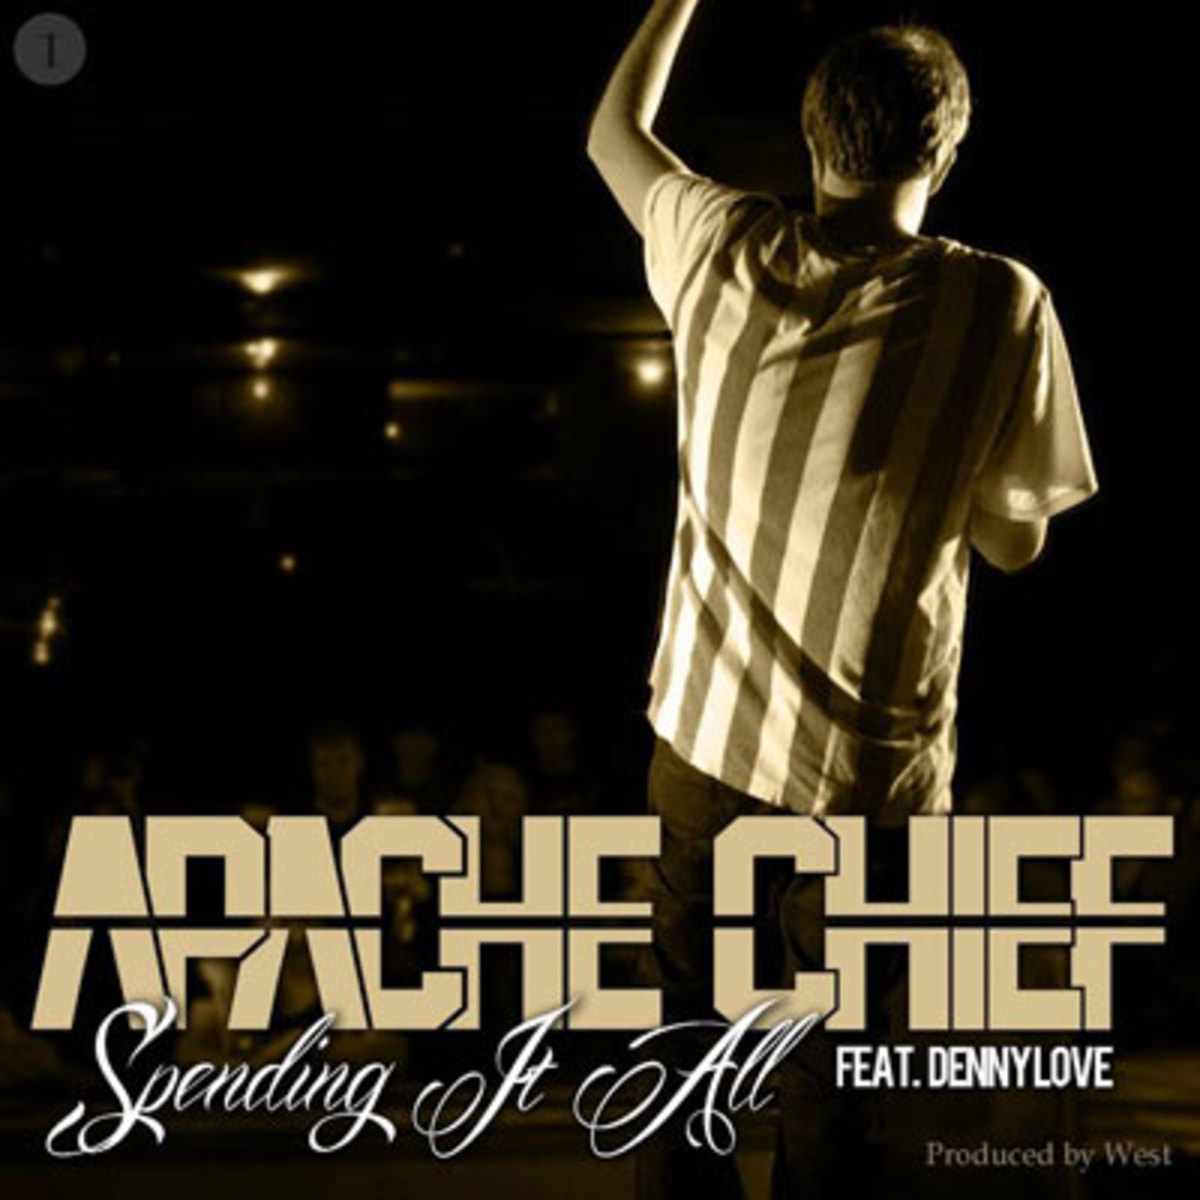 apachechief-spending.jpg